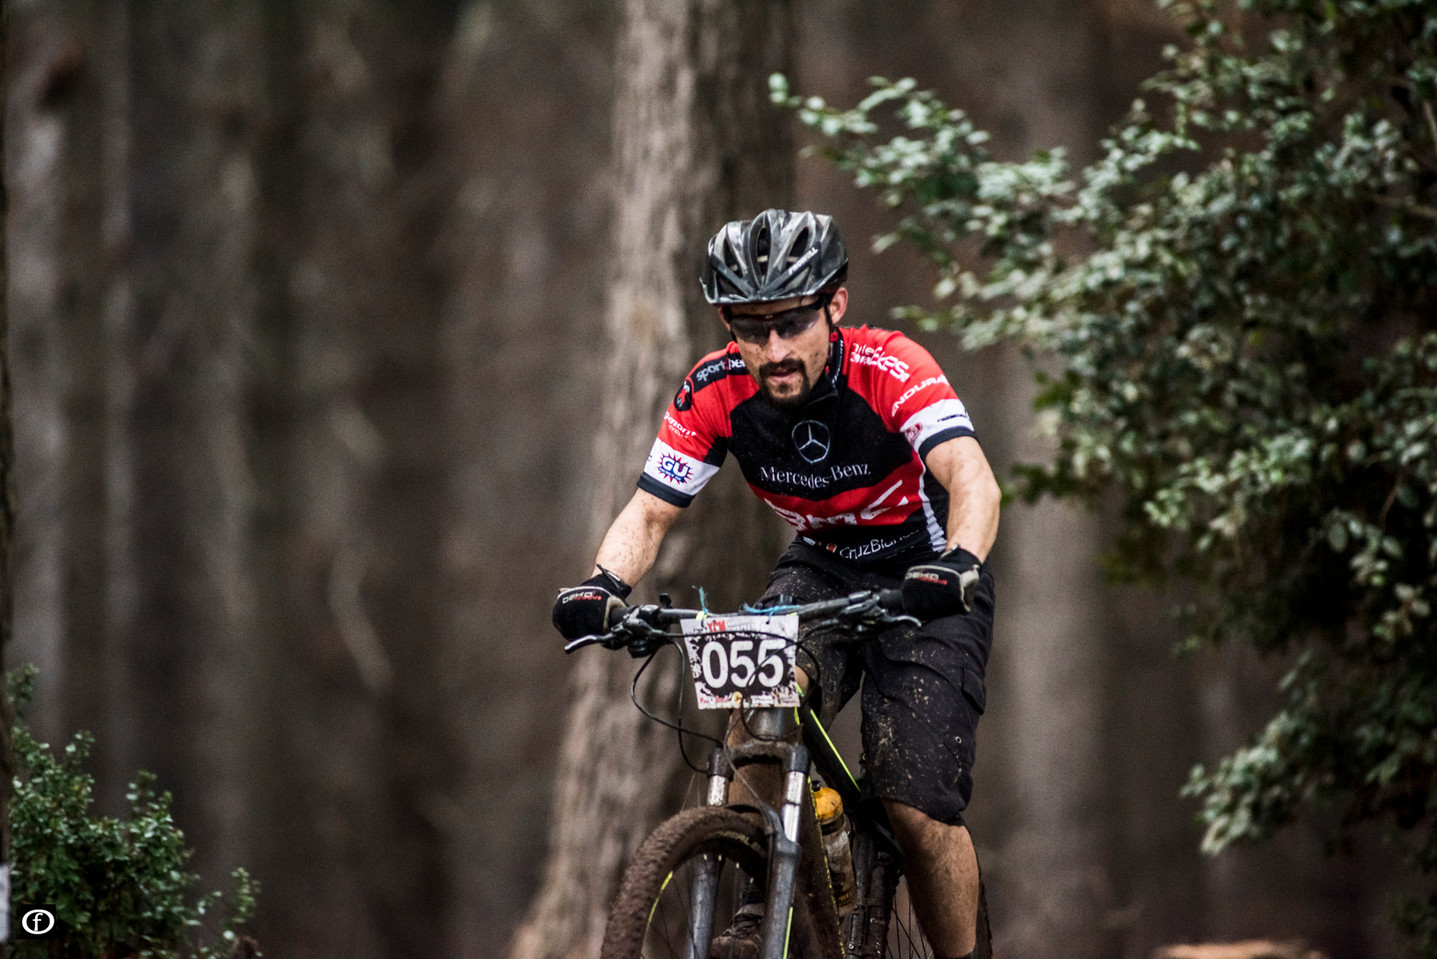 2015-05-17-Ciclismo Enduro-57.jpg